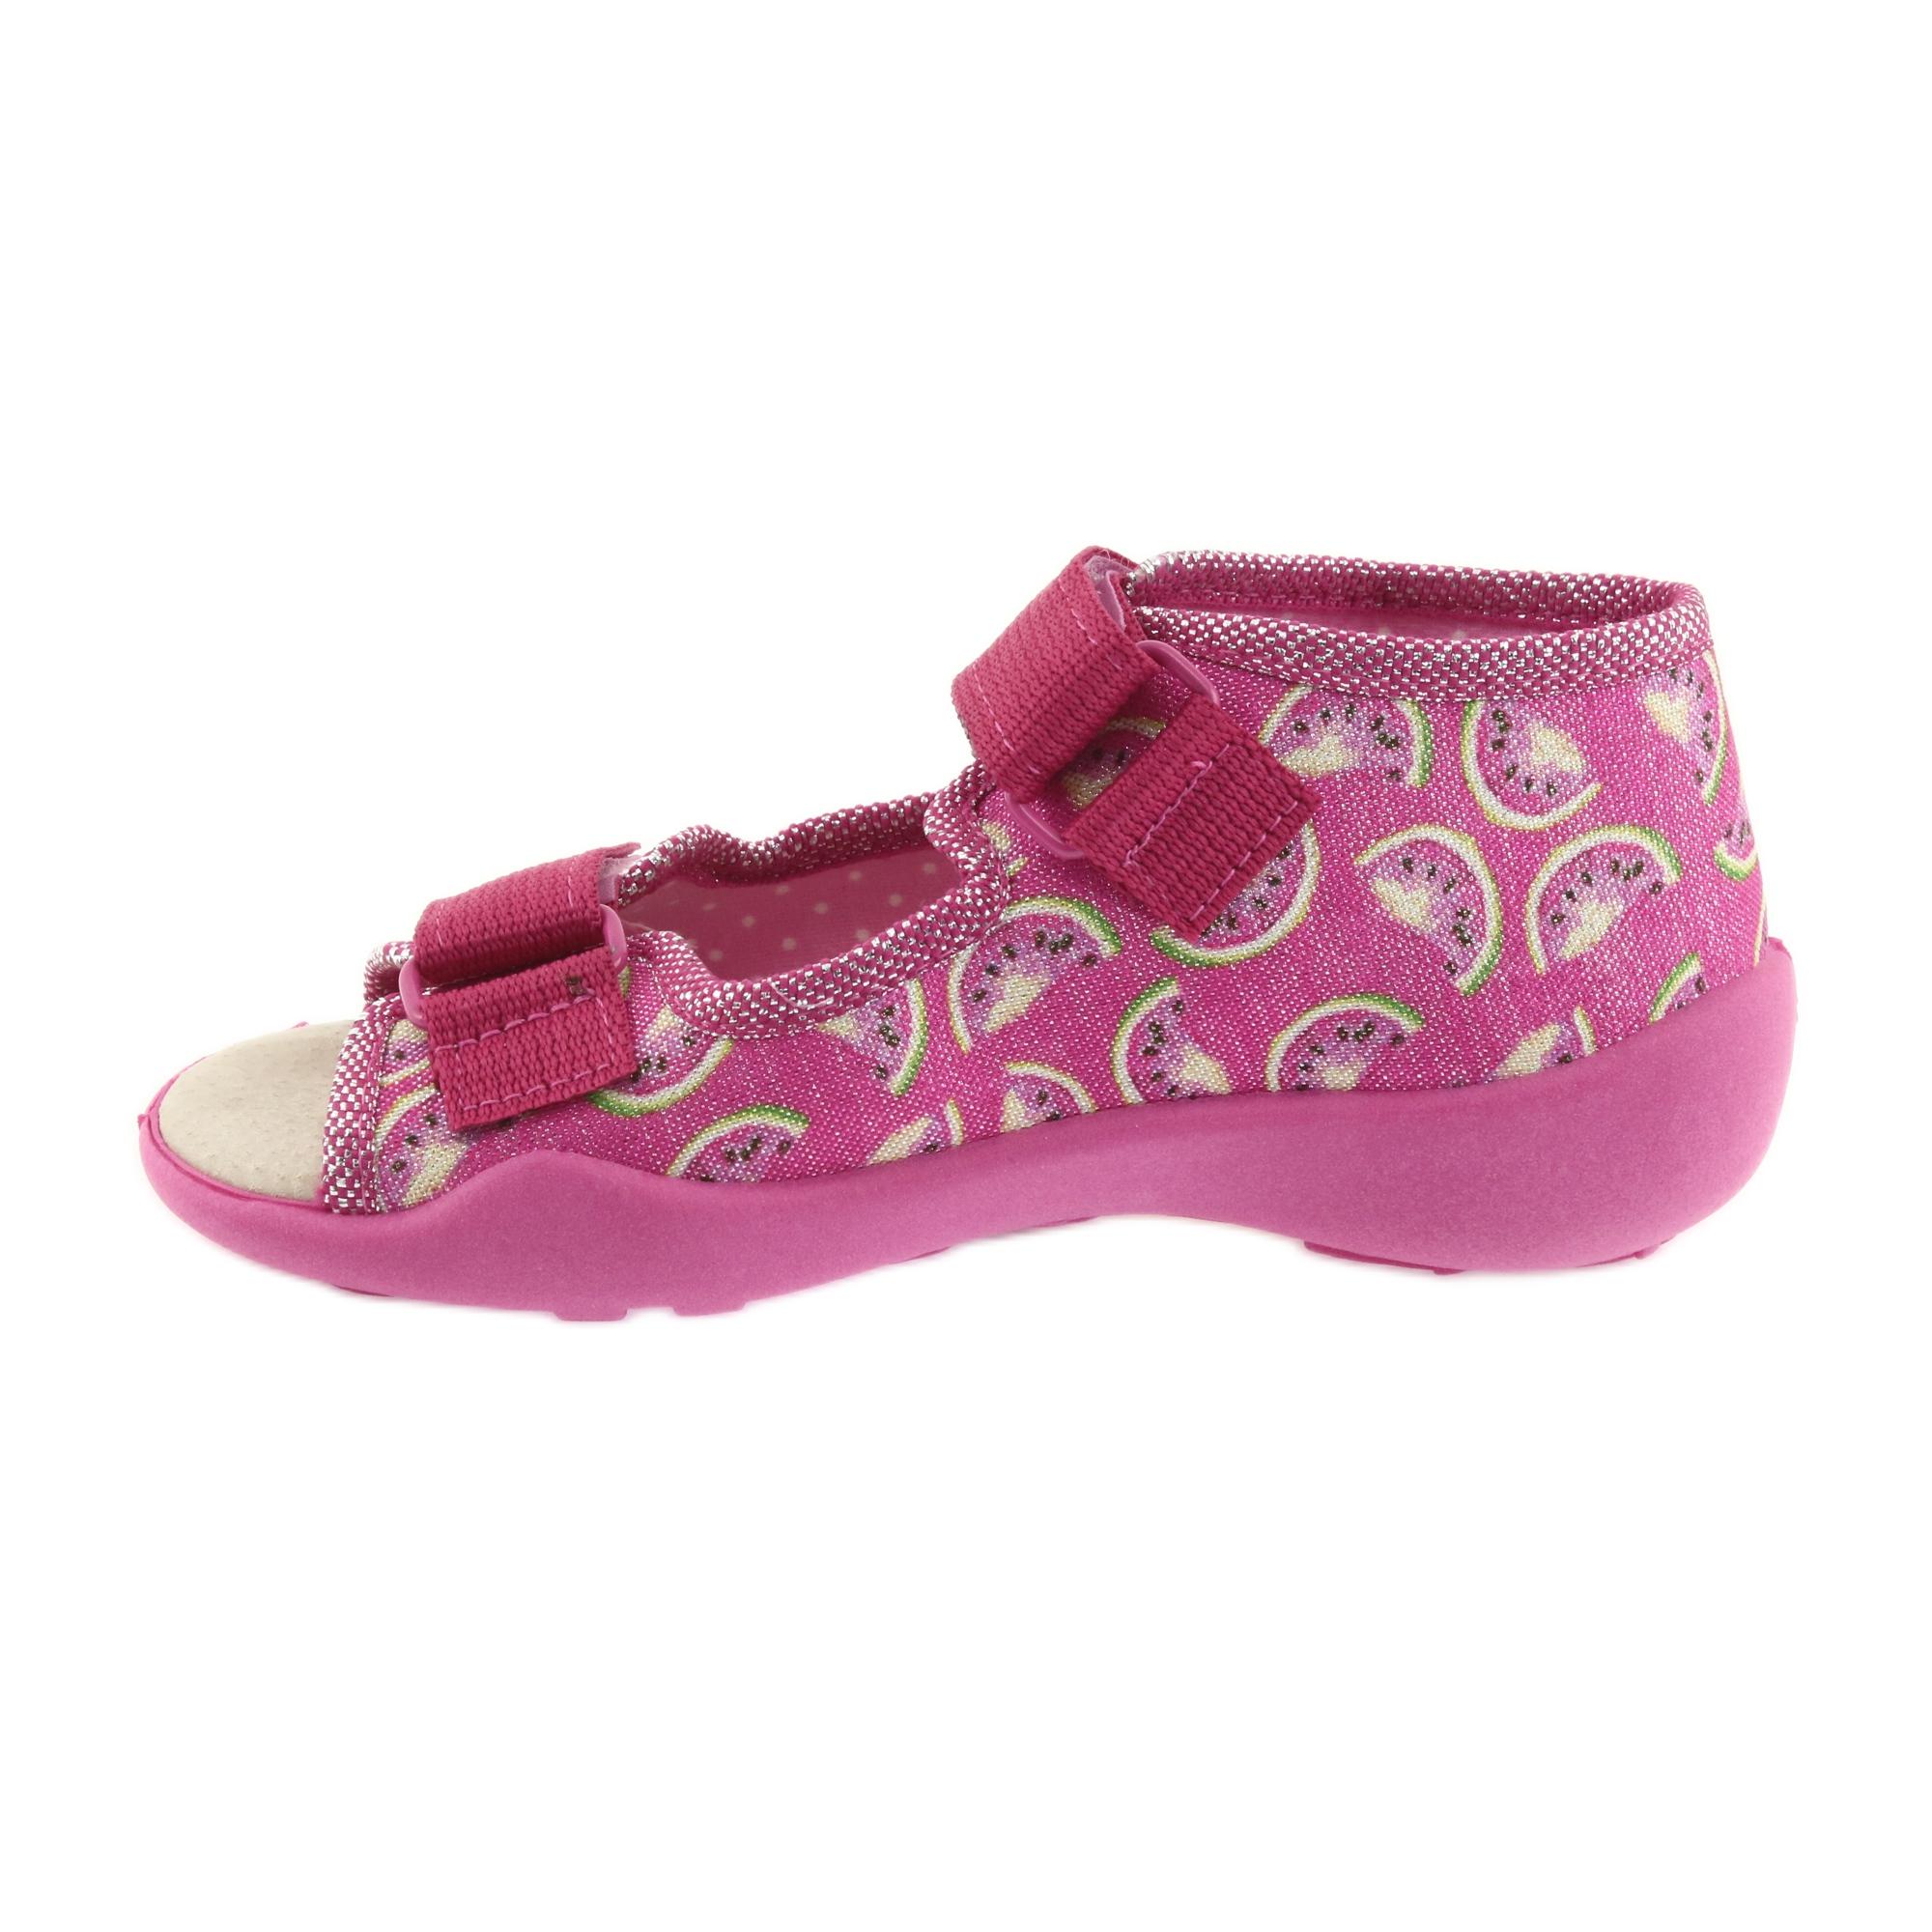 miniatura 3 - Sandali Befado scarpe da bambino 342P004 angurie grigio verde giallo rosa